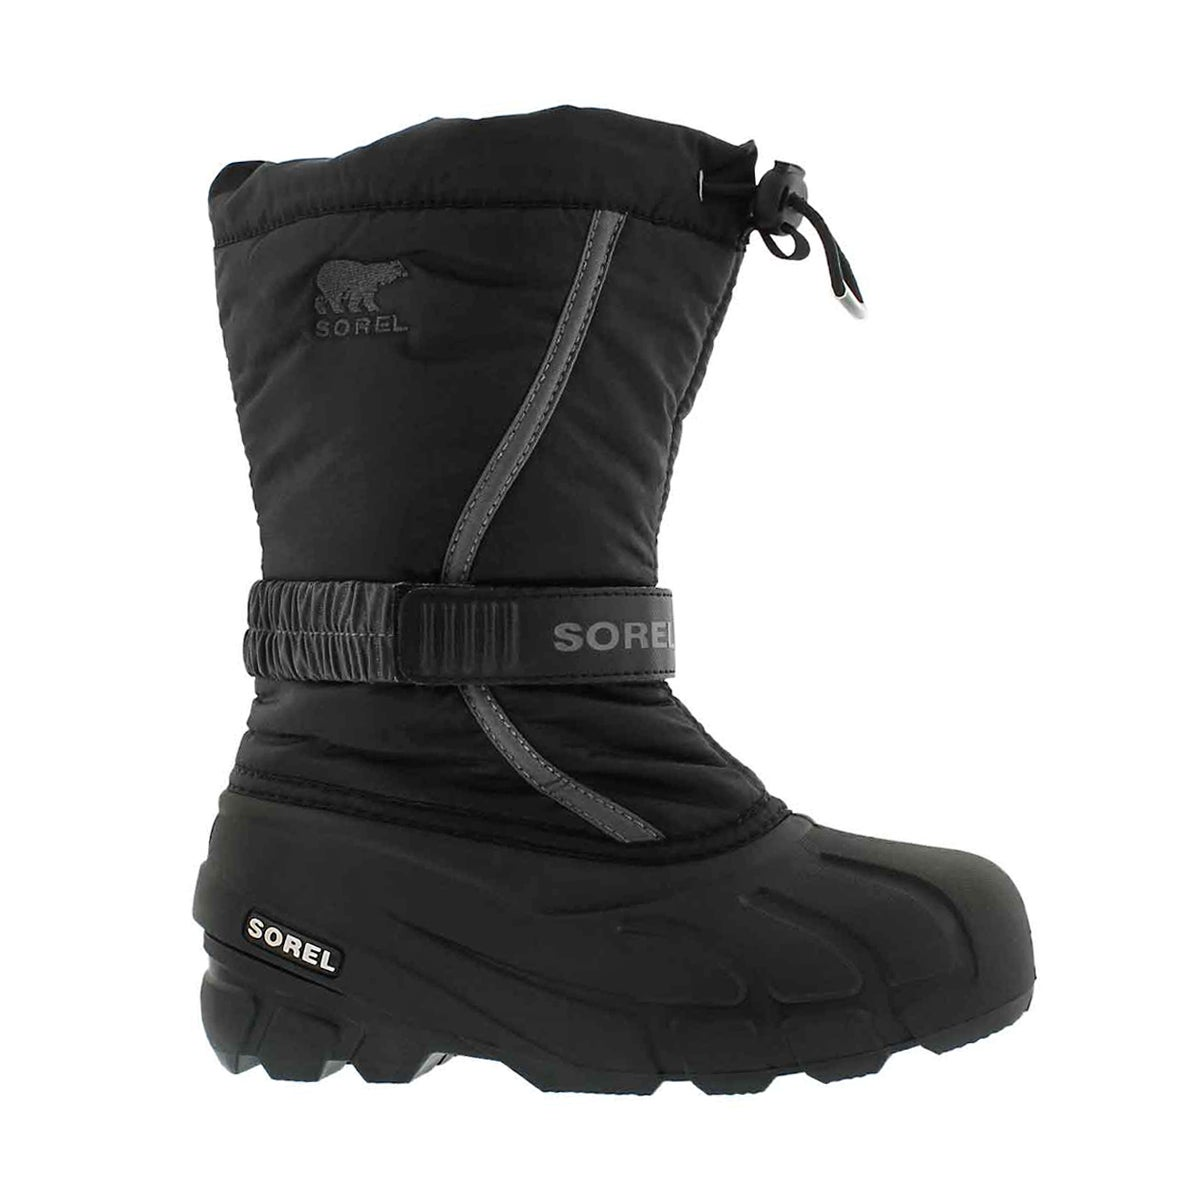 Boys' FLURRY black/grey pull on winter boots